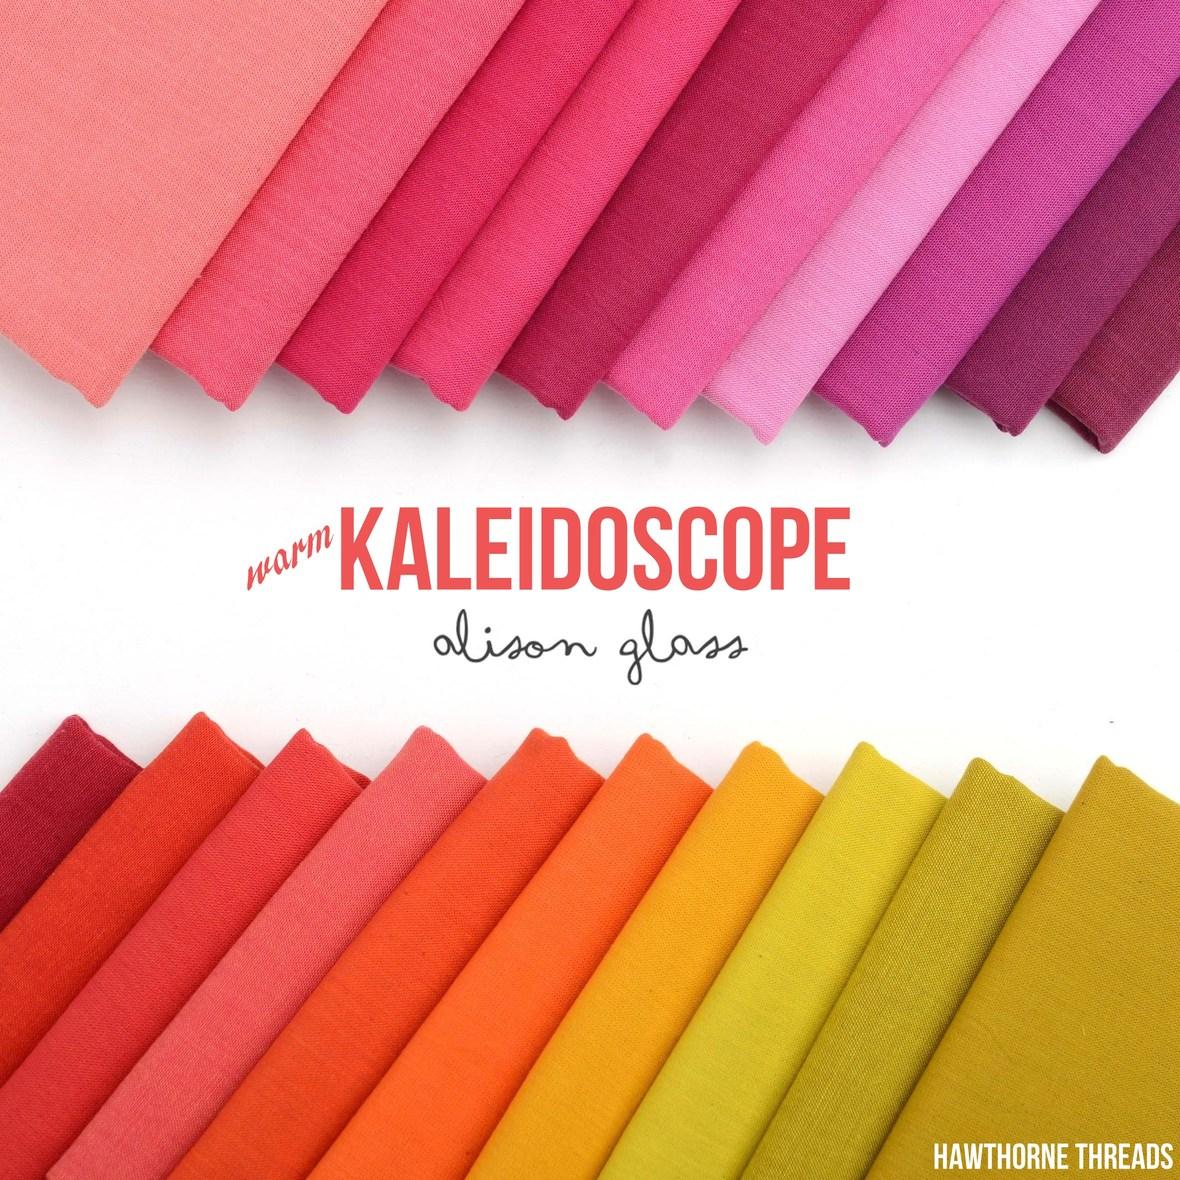 Kaleidoscope Warm Fabric Poster Alison Glass at Hawthorne Threads